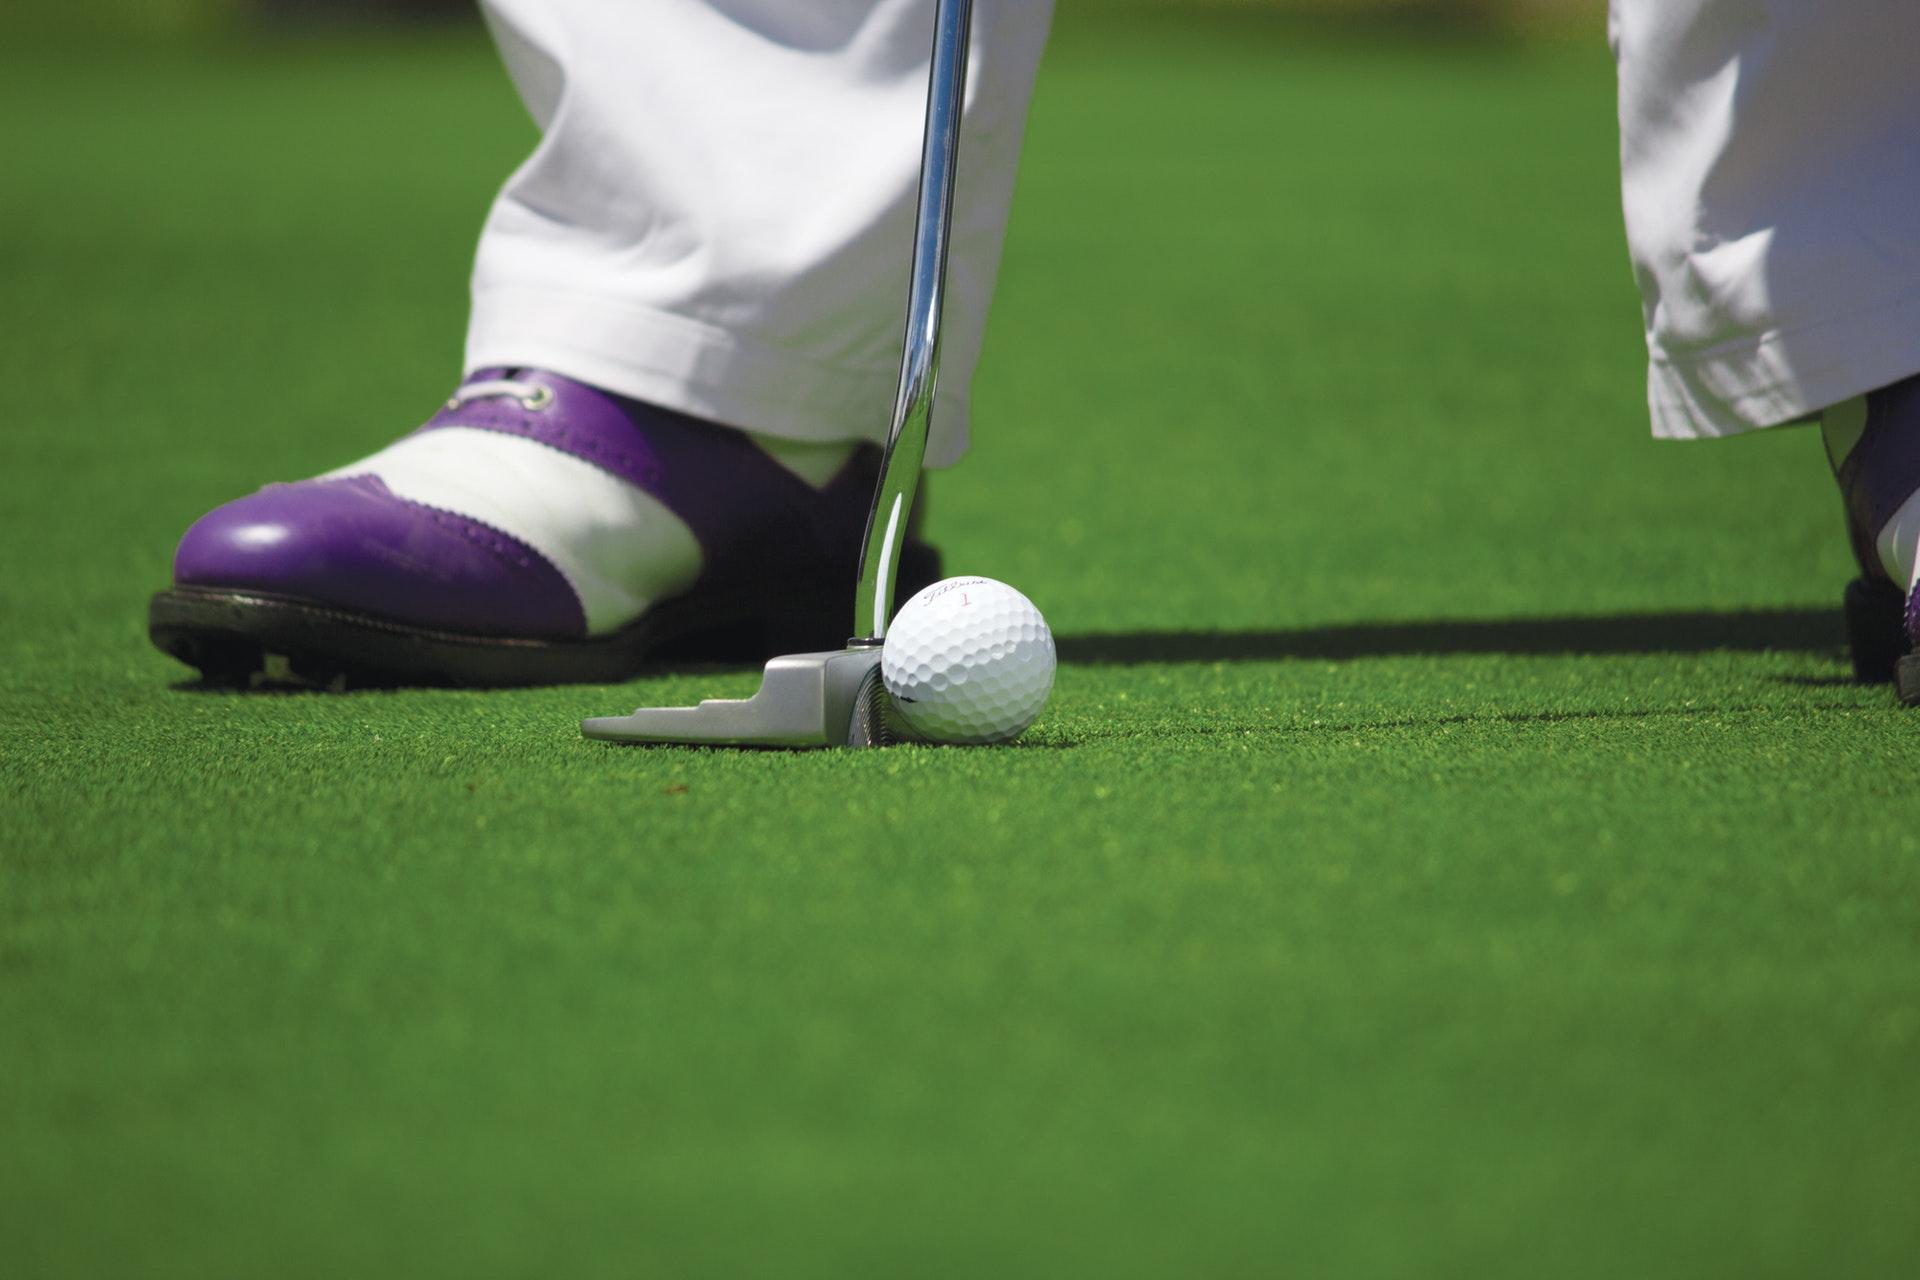 22nd Annual KofC Scramble Golf Outing – July 19, 2021